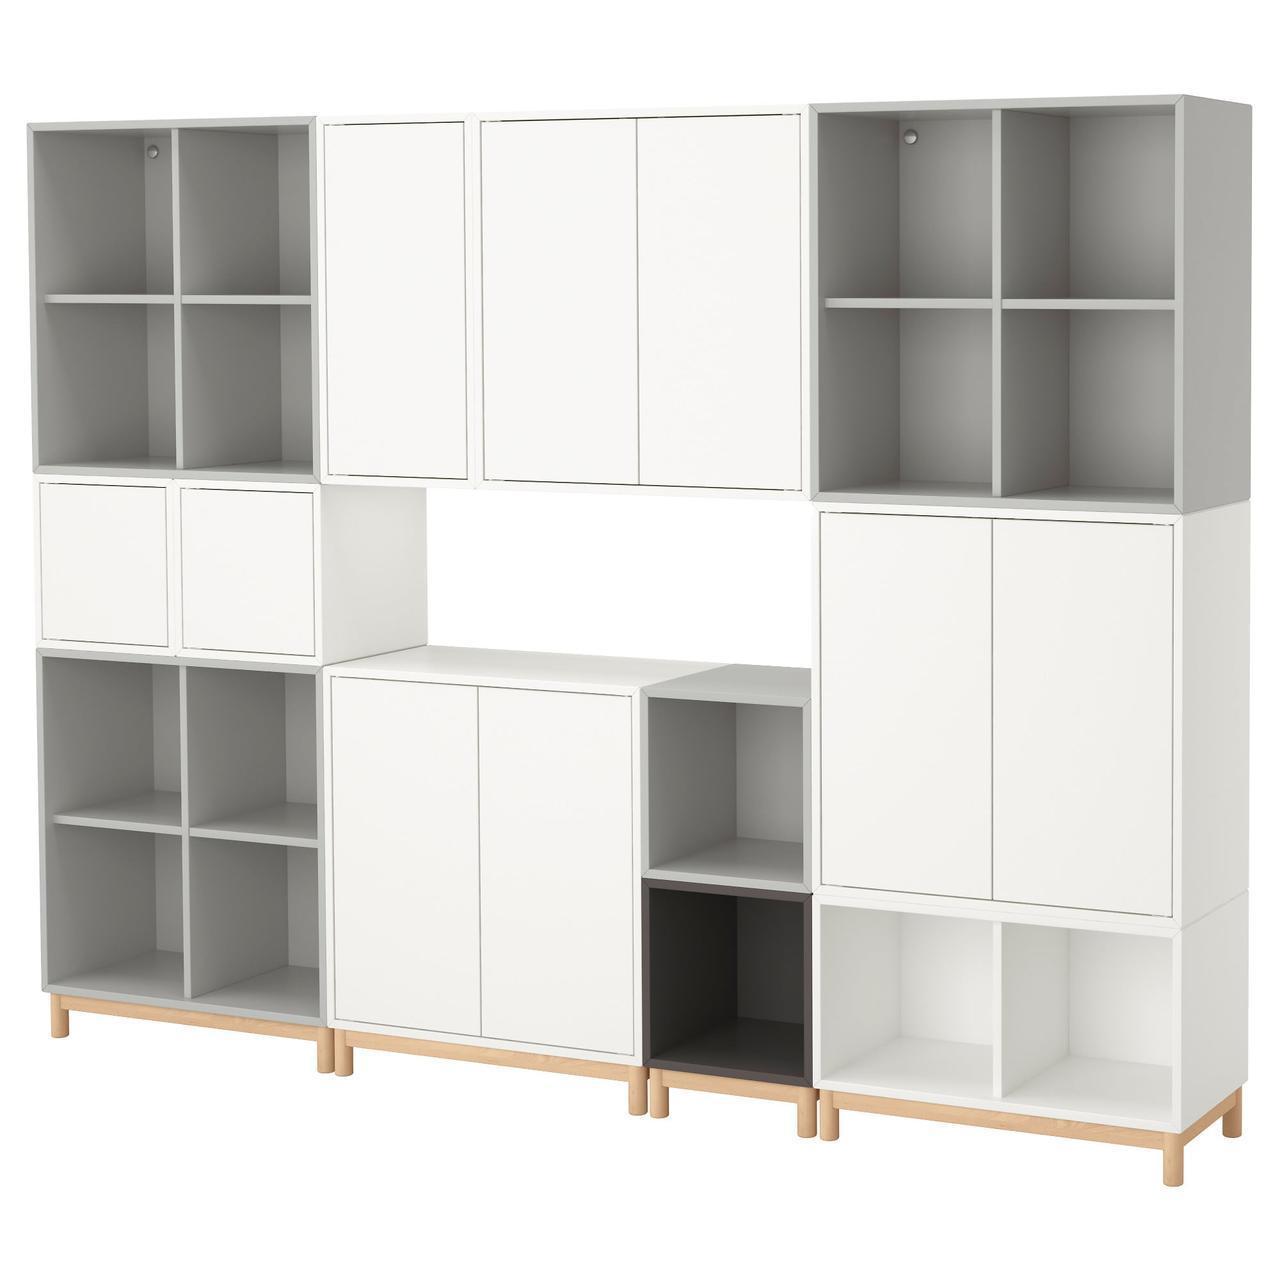 IKEA EKET Стеллаж, белый/светло-серый, темно-серый  (192.210.92)